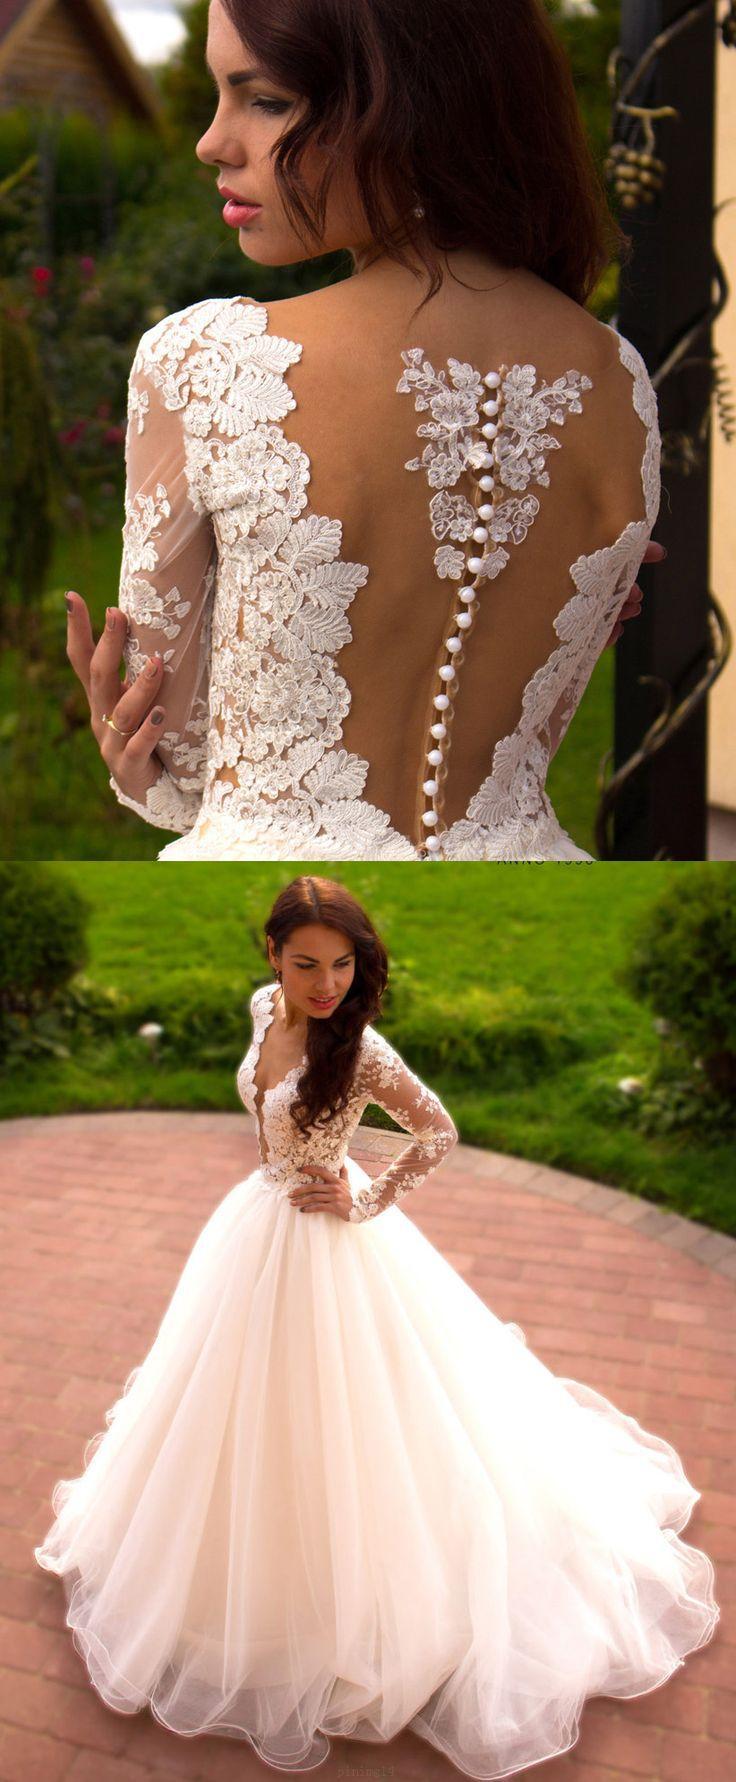 Wedding - Custom Made Long Sleeve Wedding Dress Long White Wedding Dresses With Tulle Zipper Applique Easy Dresses WF02G53-897